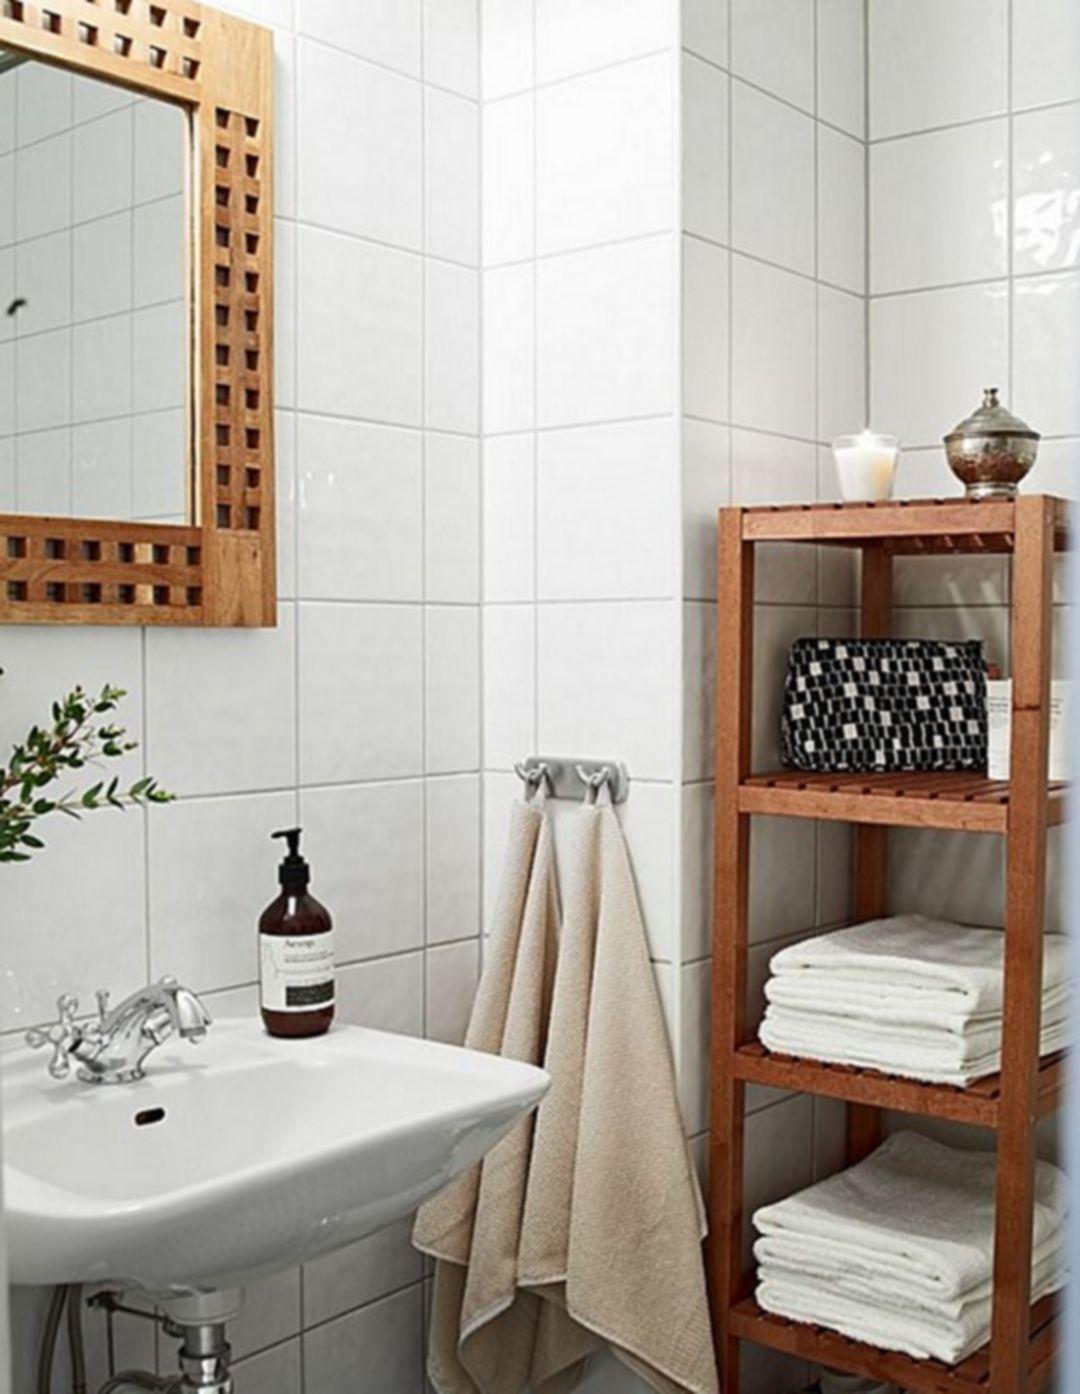 Epic 25 Simple and Elegant Bathroom Decorating Ideas For ...